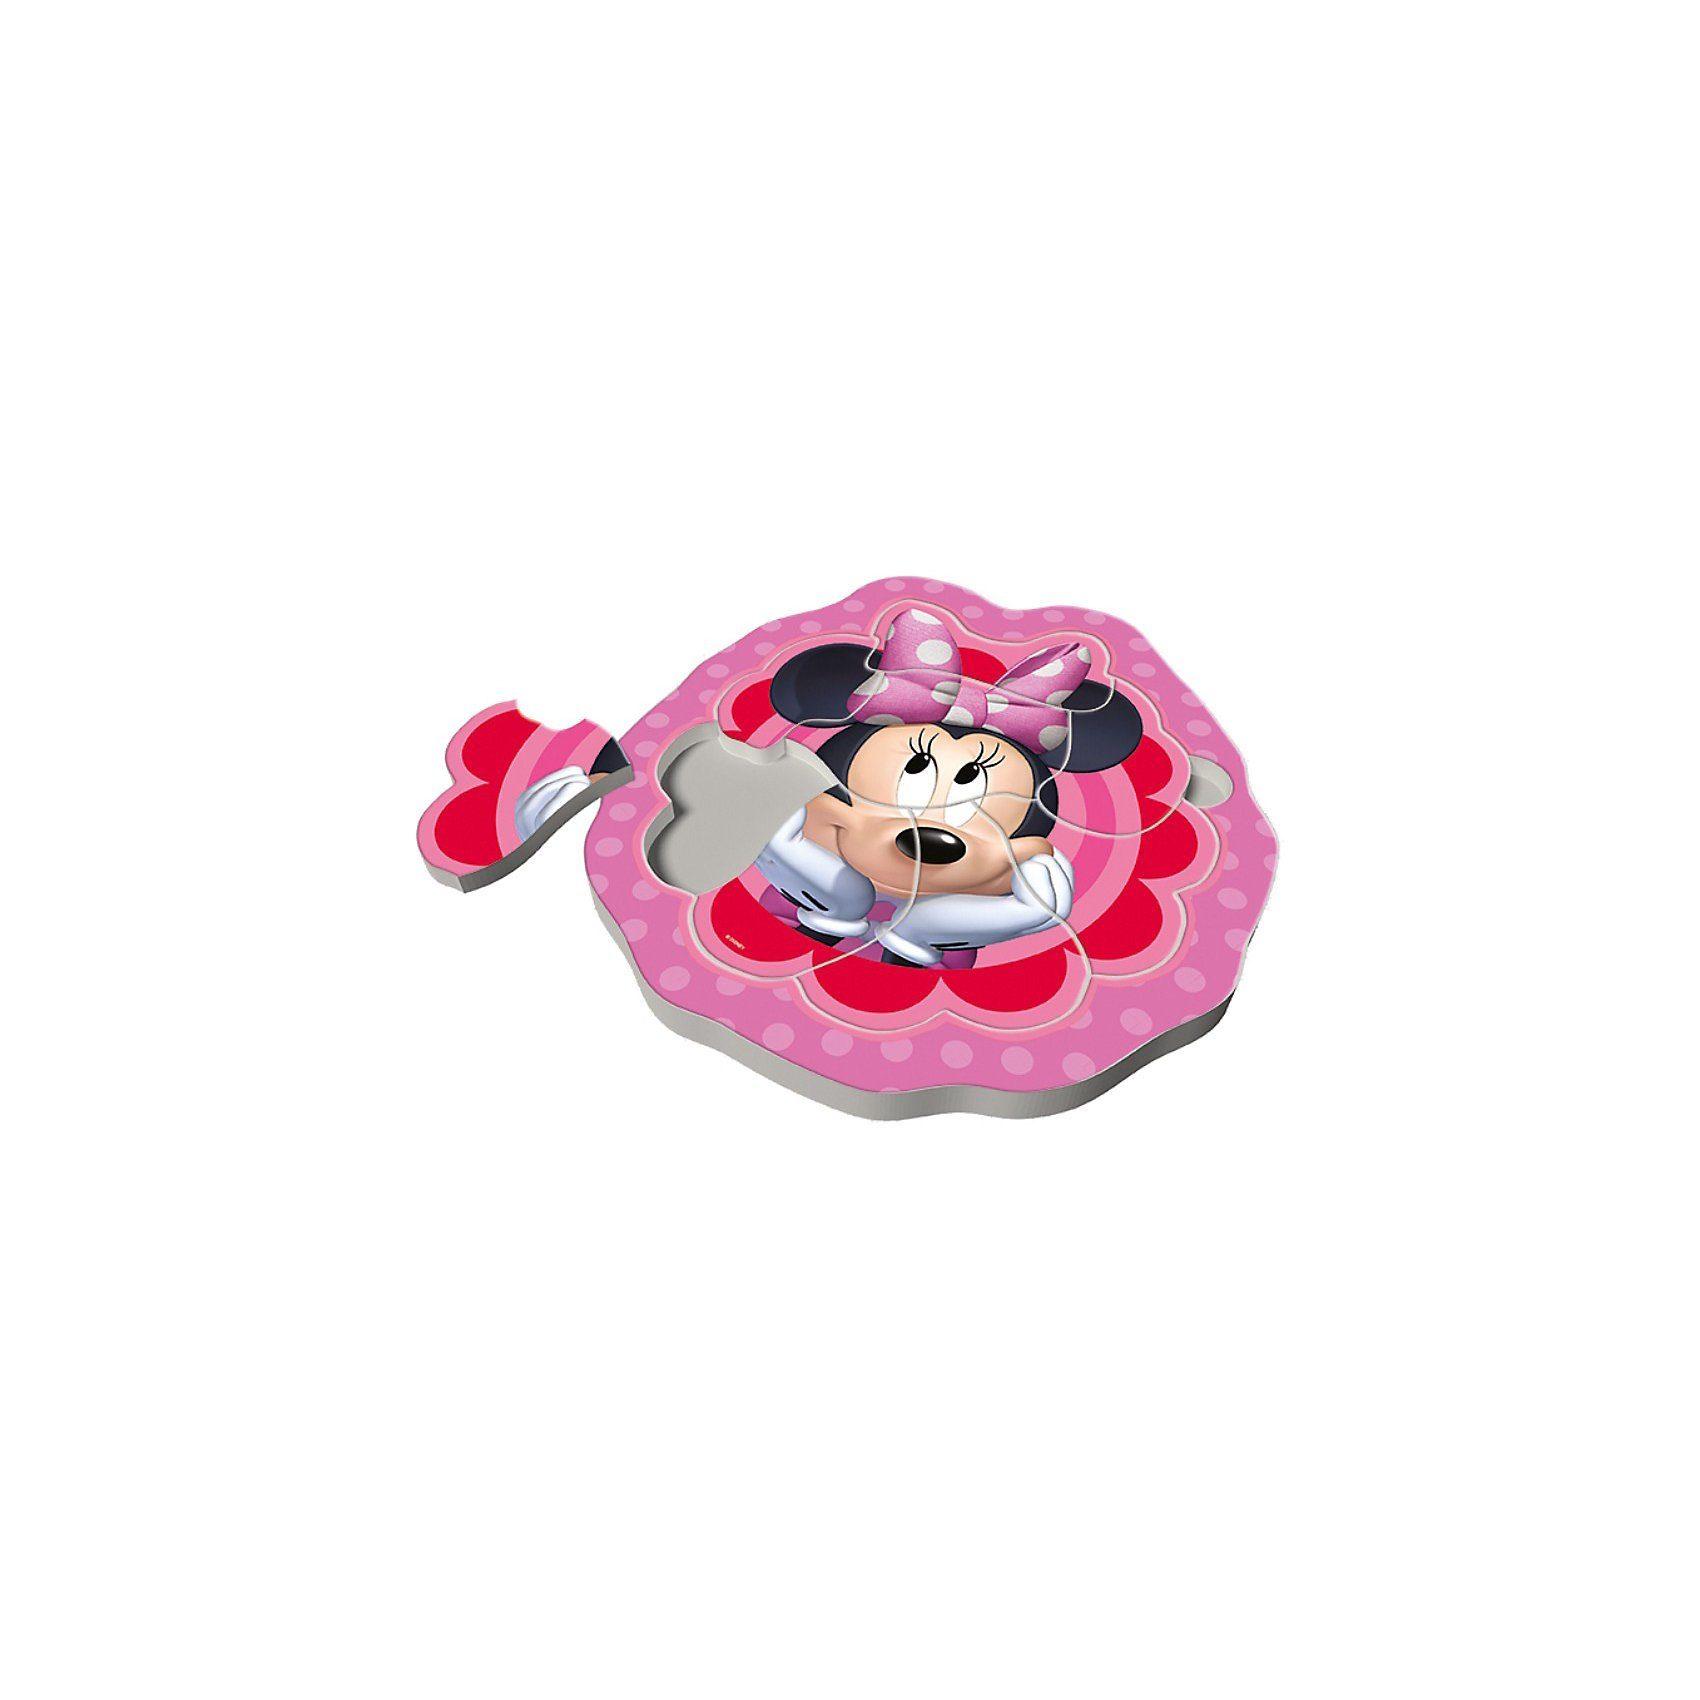 Trefl Rahmenpuzzle Baby Fun - Minnie Mouse